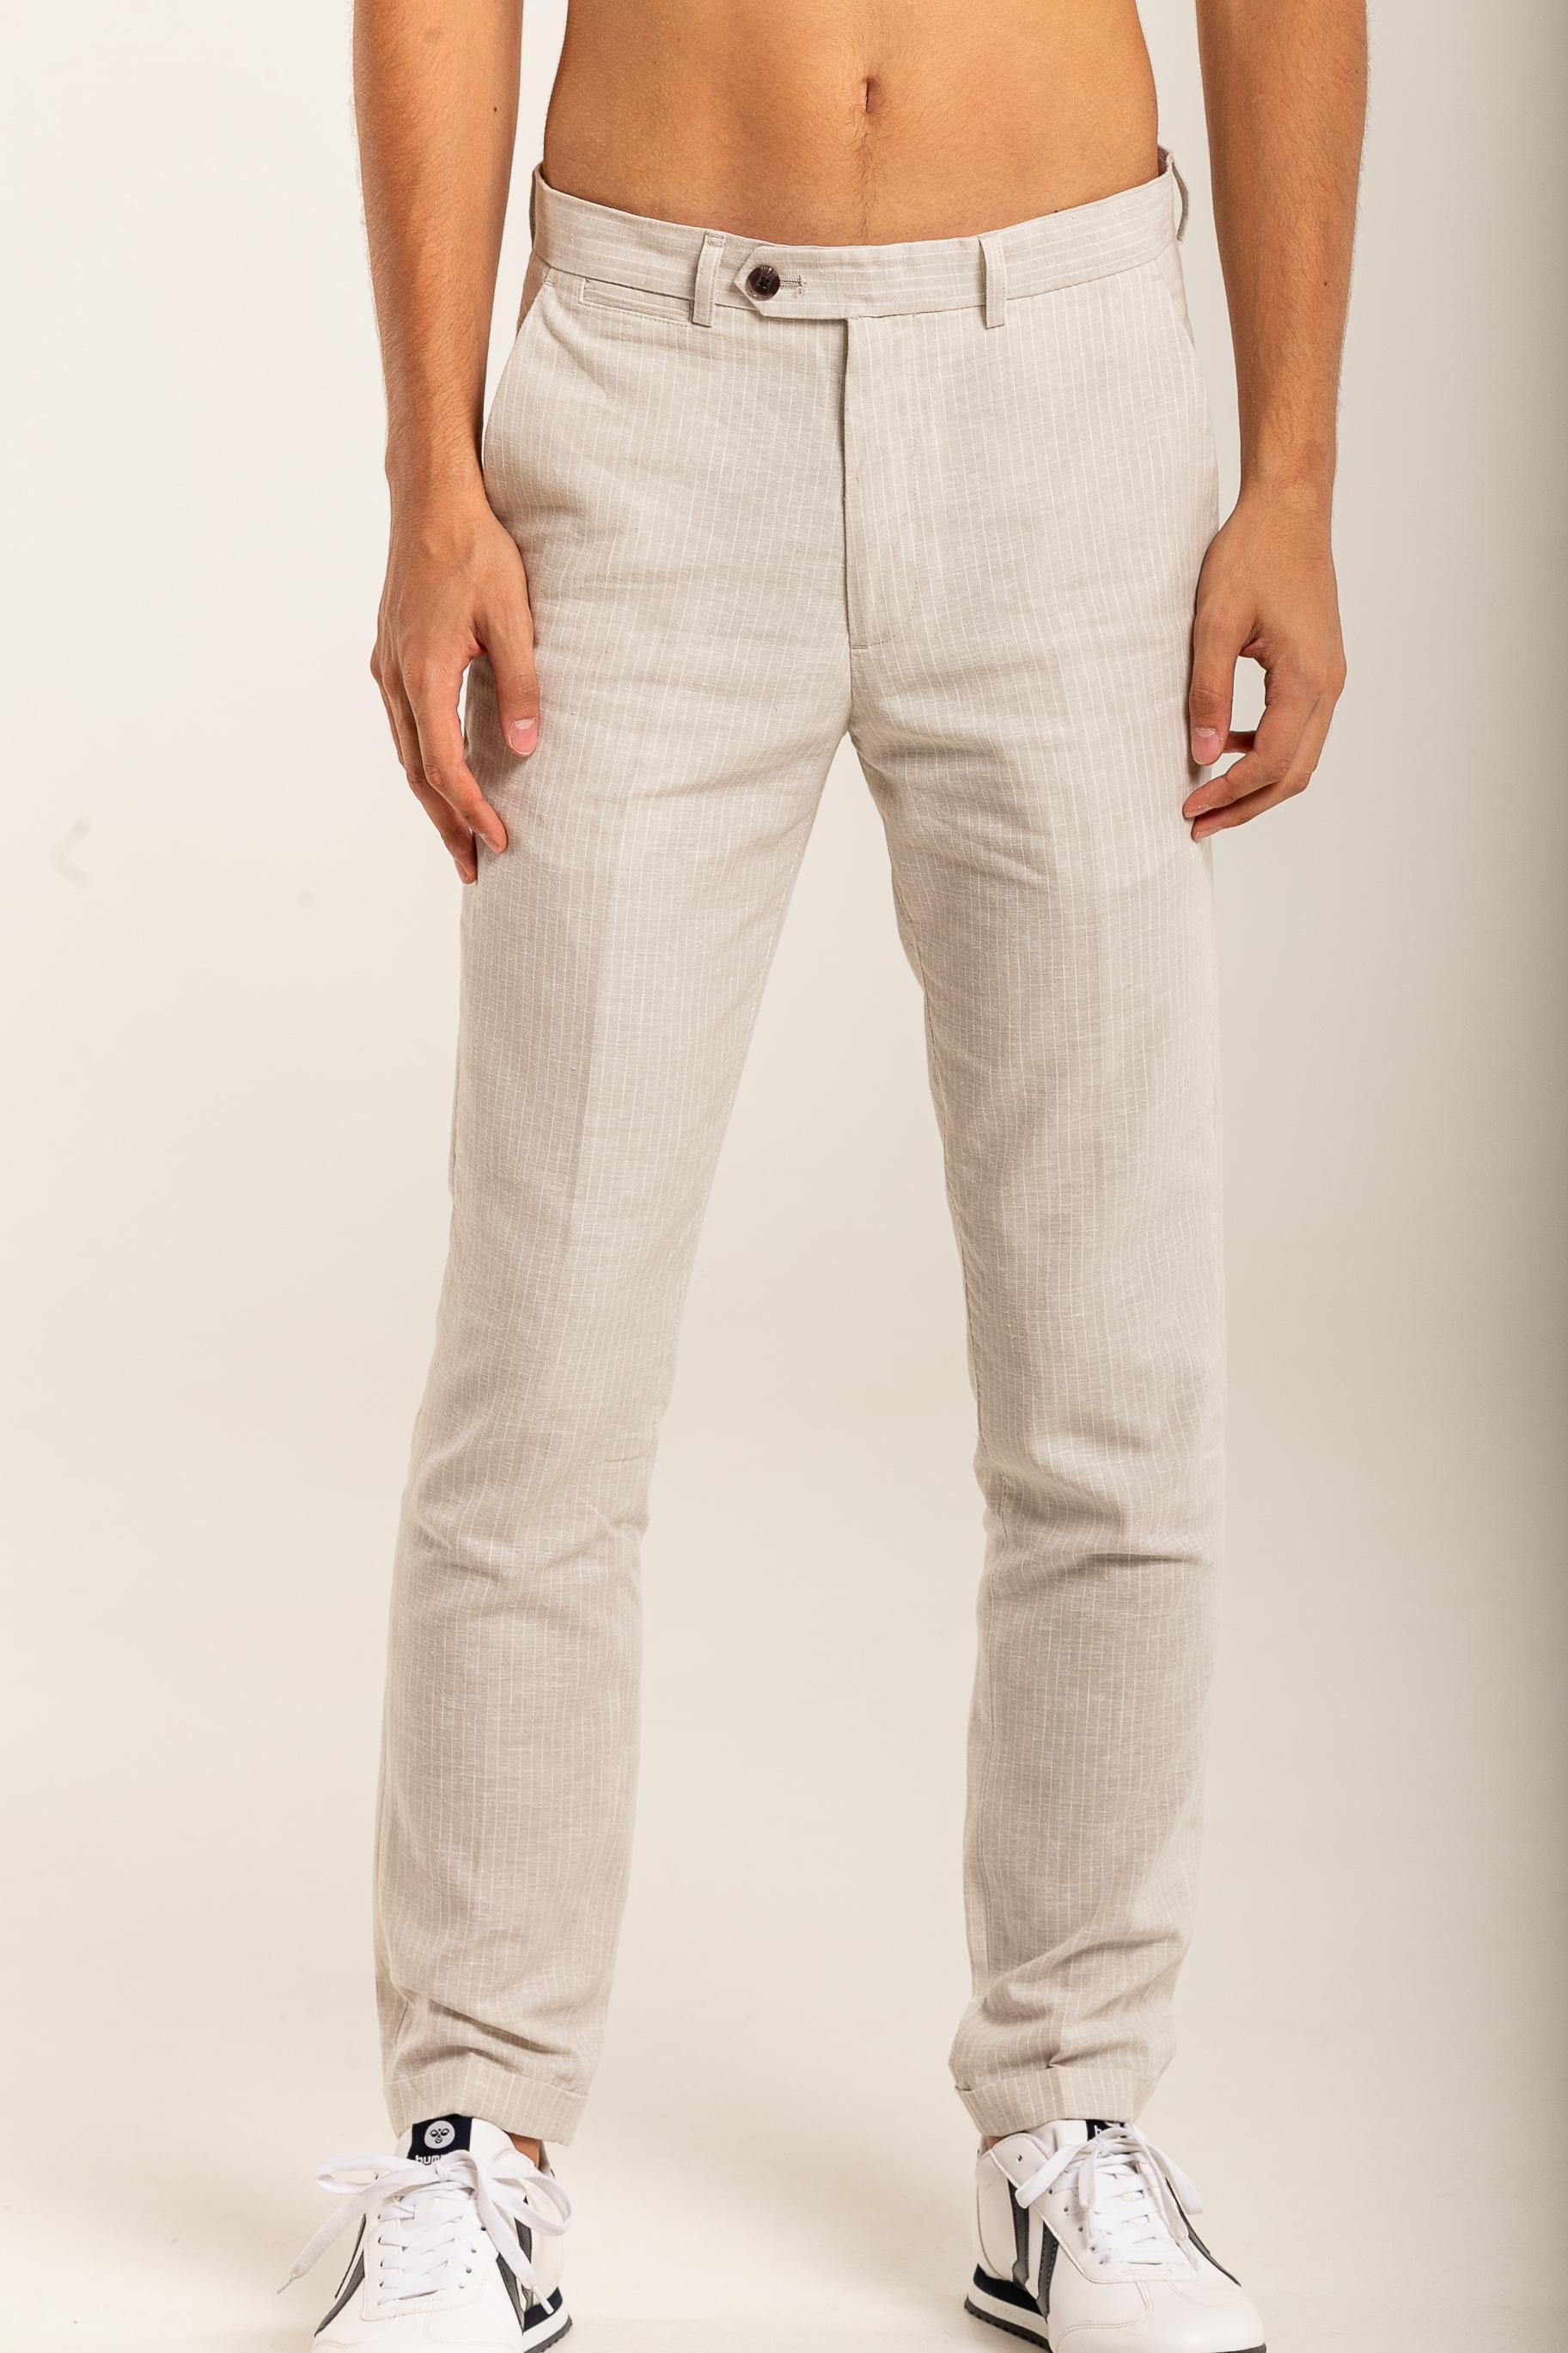 Pantaloni Jack & Jones Clasic (3731) photo